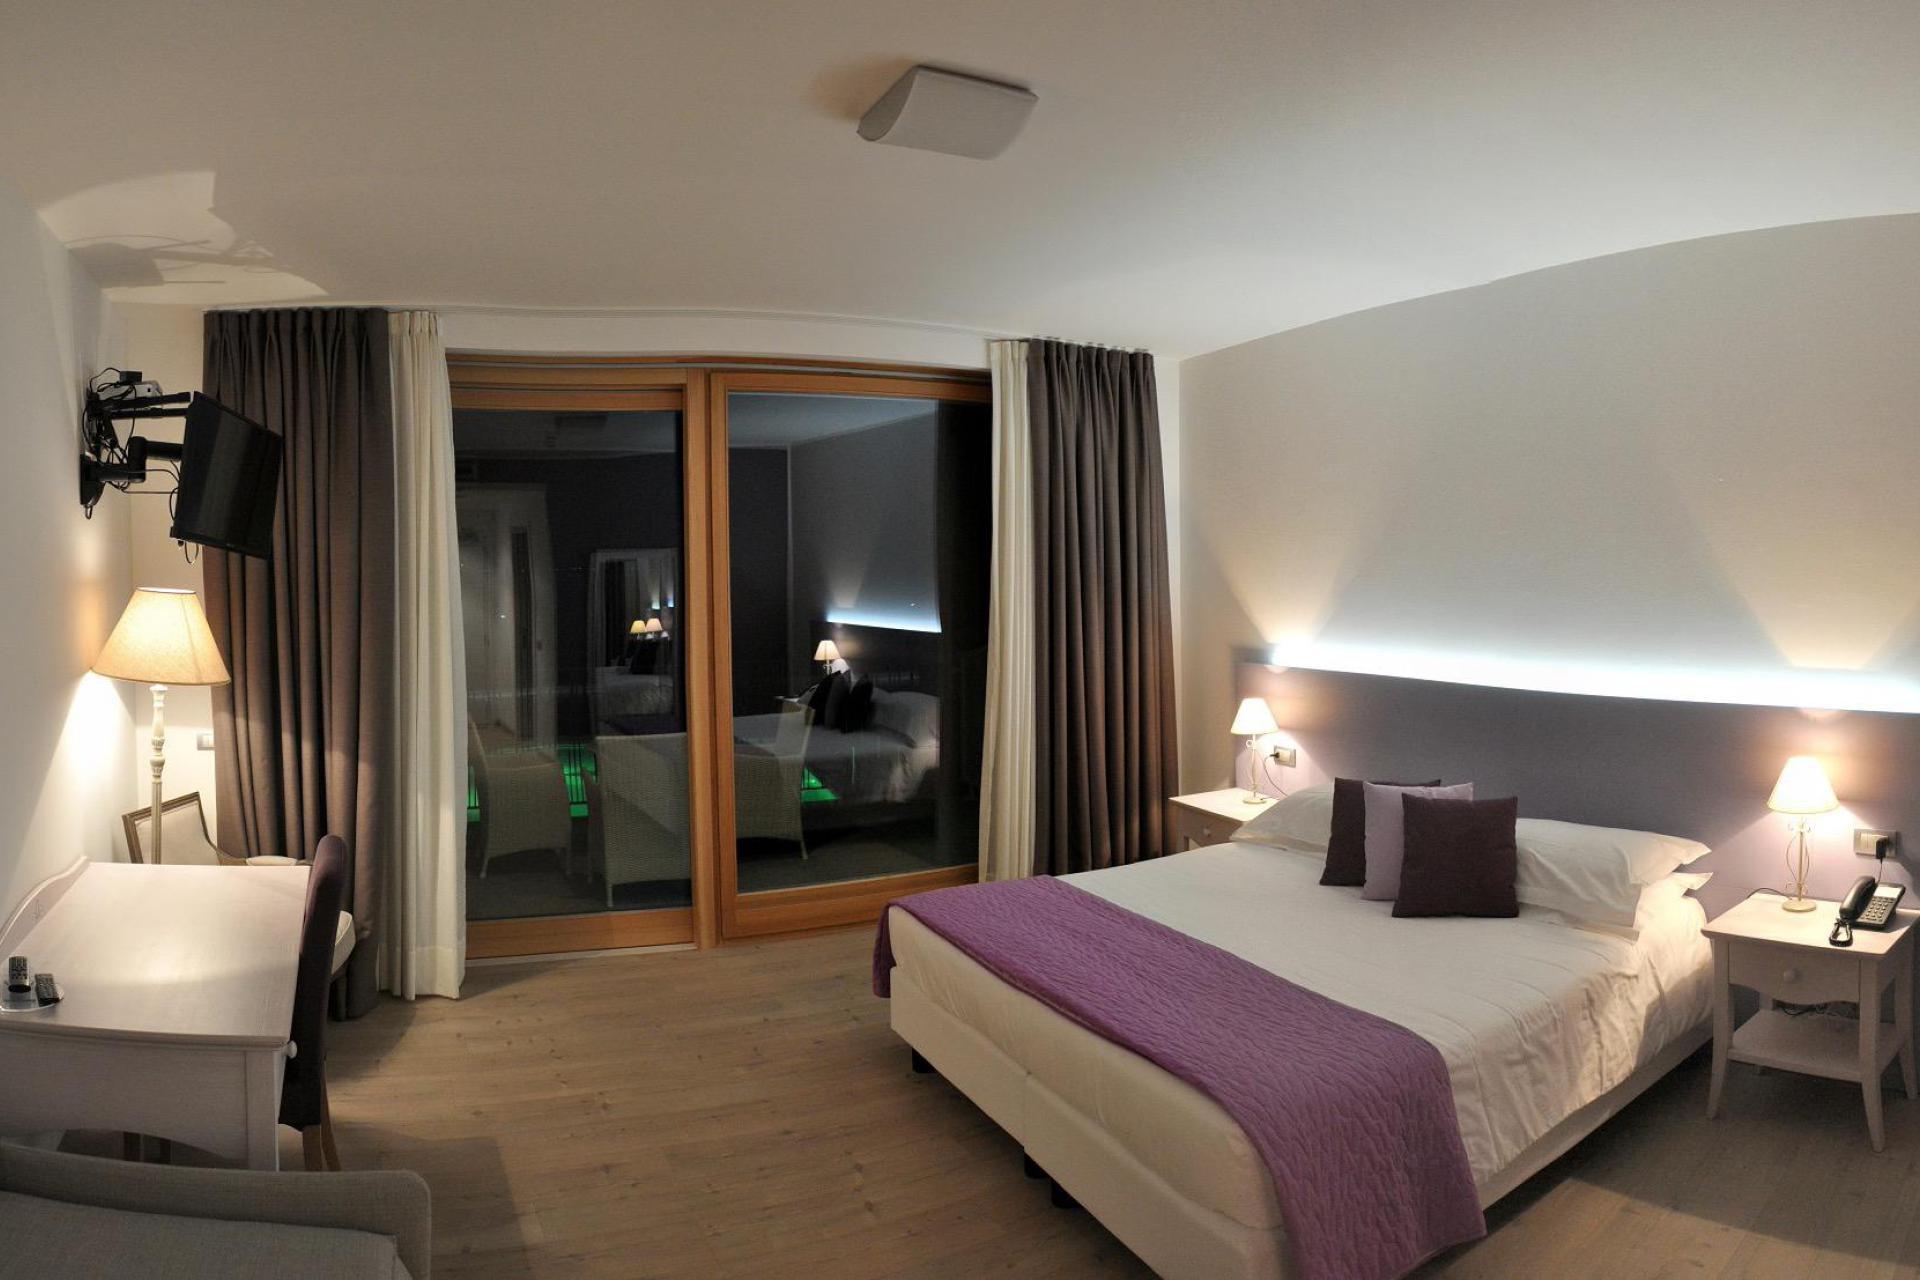 Agriturismo Lake Como and Lake Garda Small country hotel in wonderful location on Lake Como